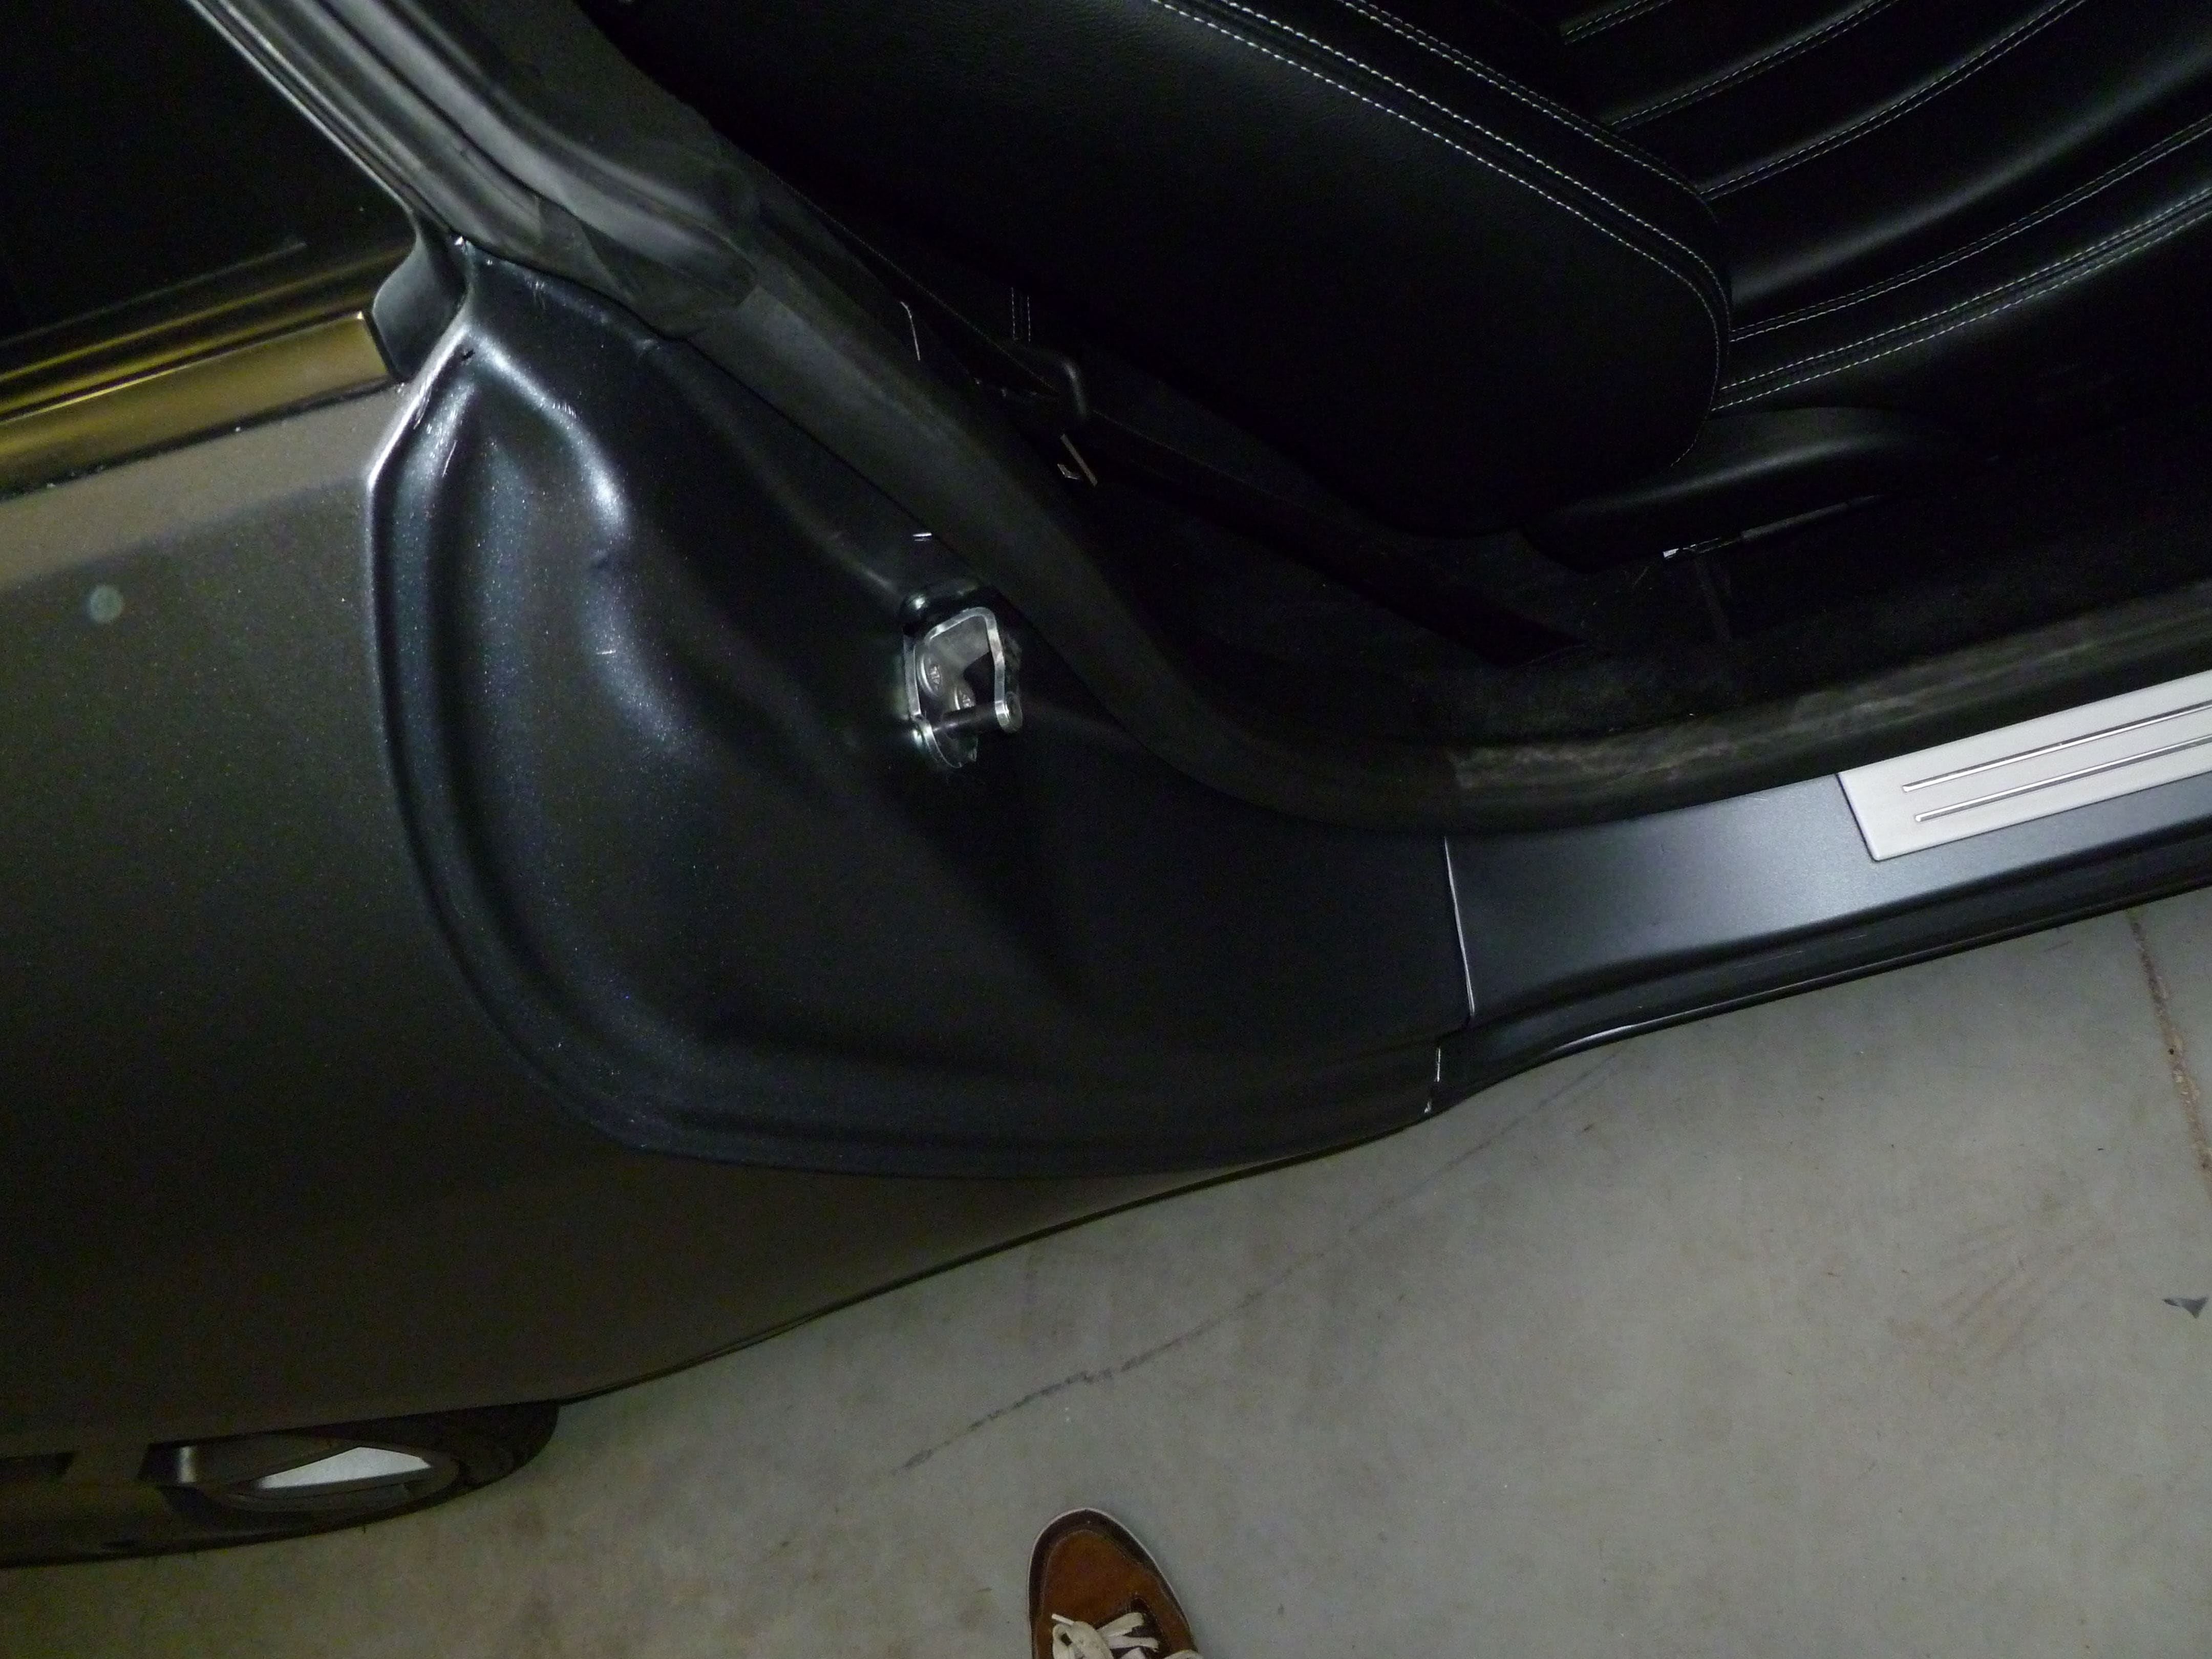 Maserati Gran Turismo met Mat Zwarte Wrap, Carwrapping door Wrapmyride.nu Foto-nr:6064, ©2020